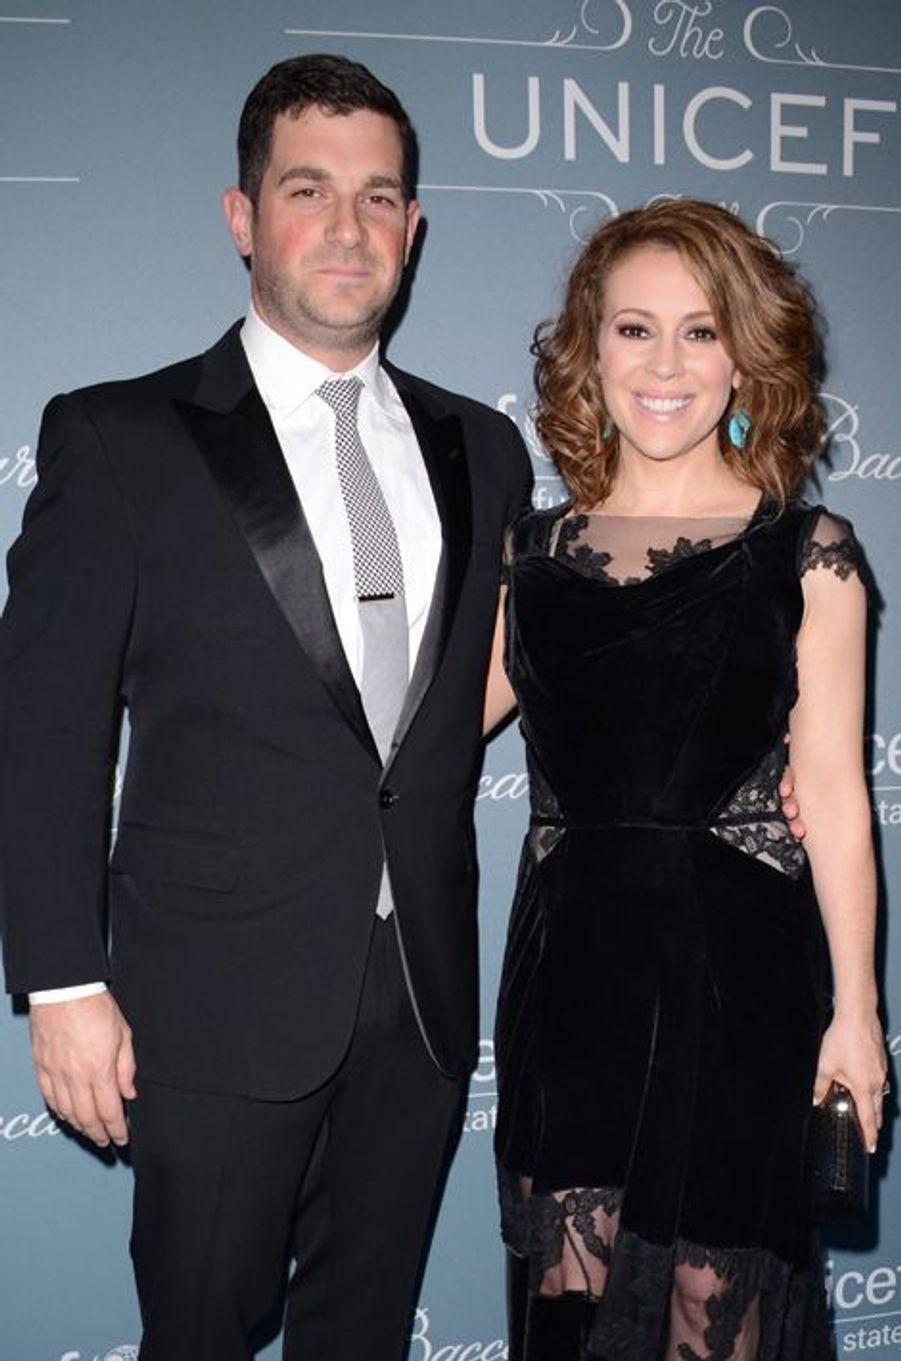 Alyssa Milano et son mari David Bugliari à Los Angeles, le 14 janvier 2014.